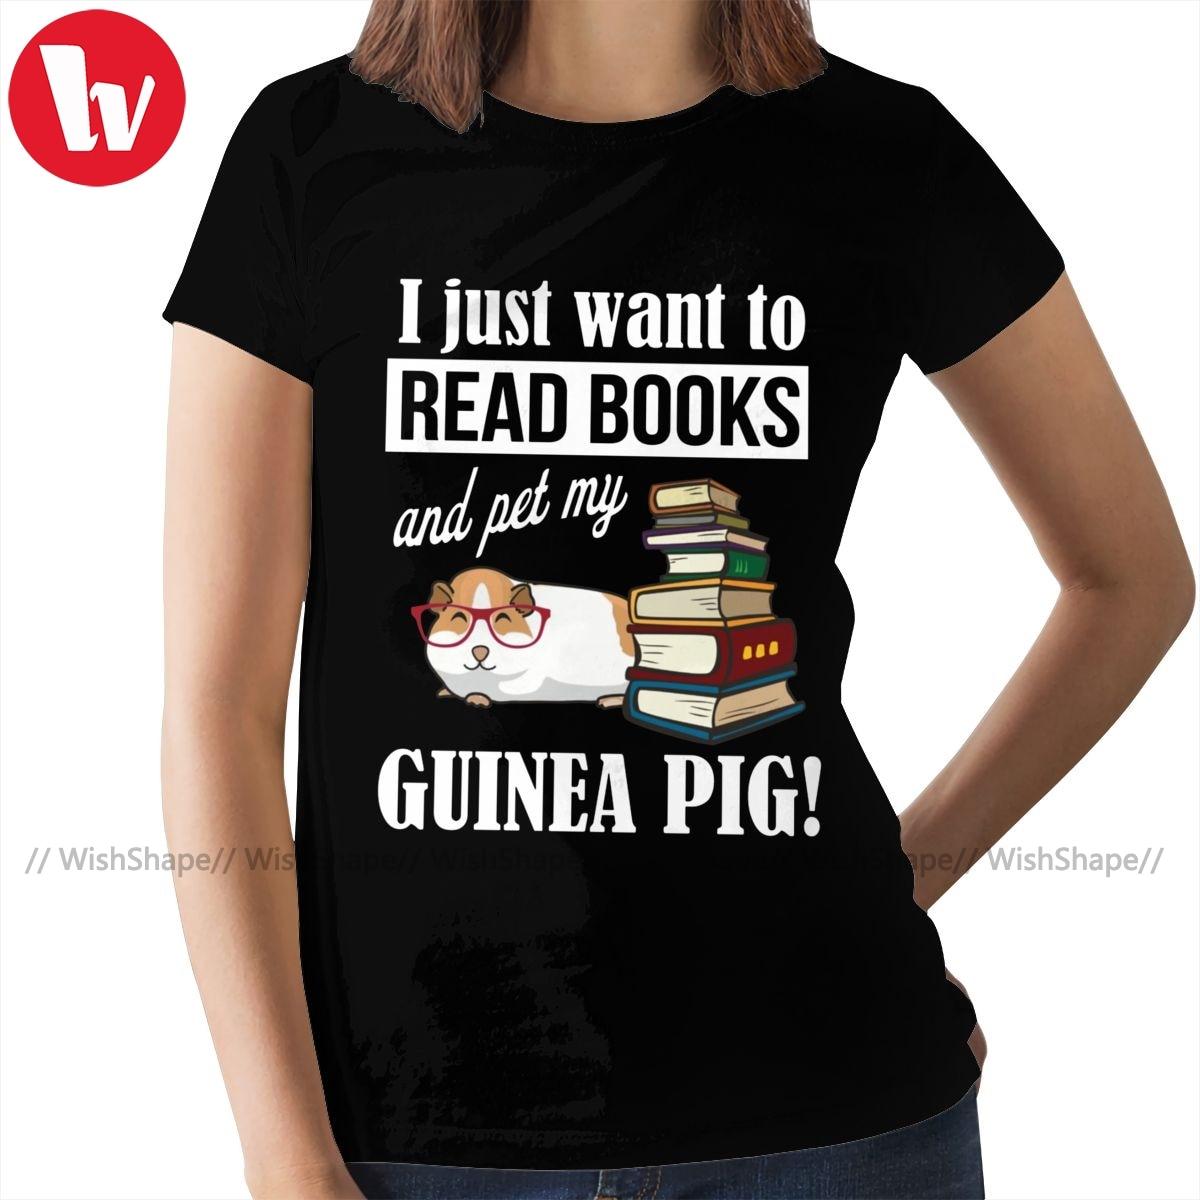 Guinea Pig T-Shirt Guinea Pig T Shirt New Fashion O Neck Women tshirt White Cotton Ladies Tee Shirt